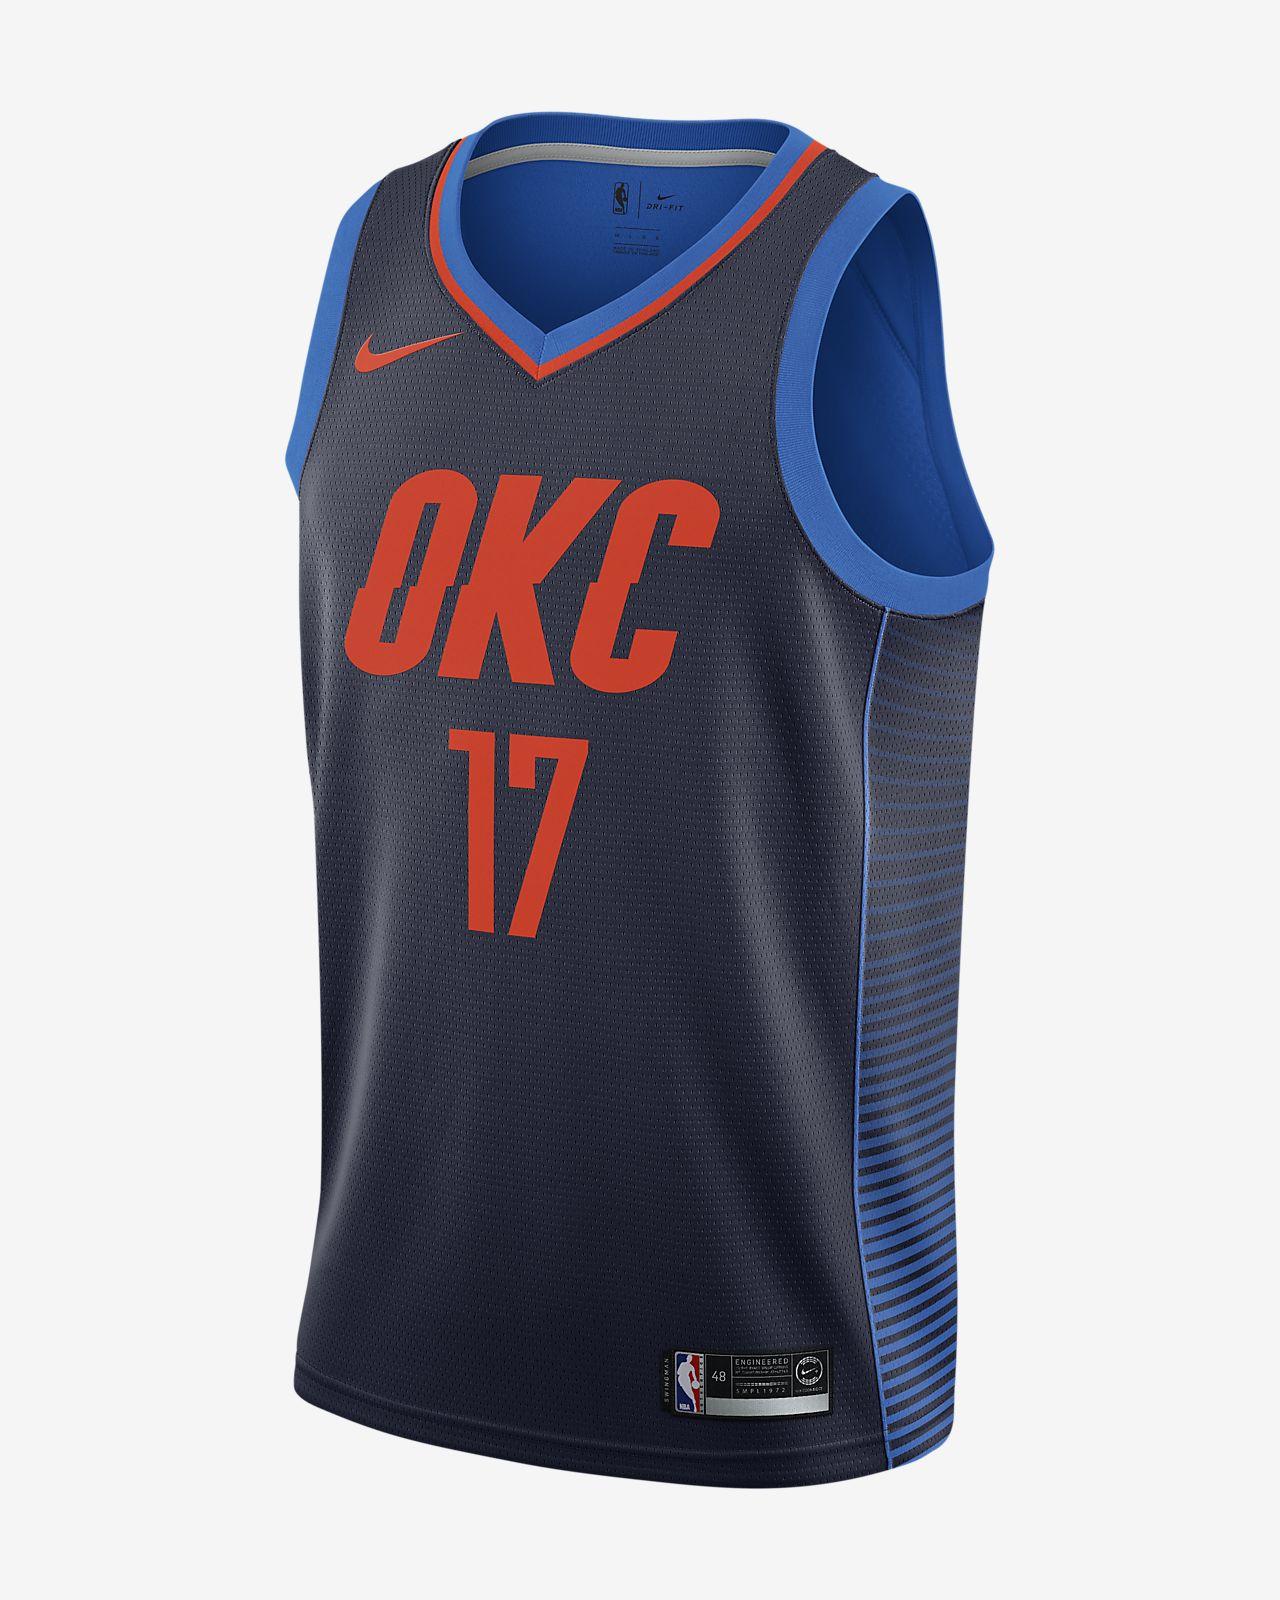 Pánský dres Nike NBA Connected Statement Edition Swingman (Oklahoma City Thunder)